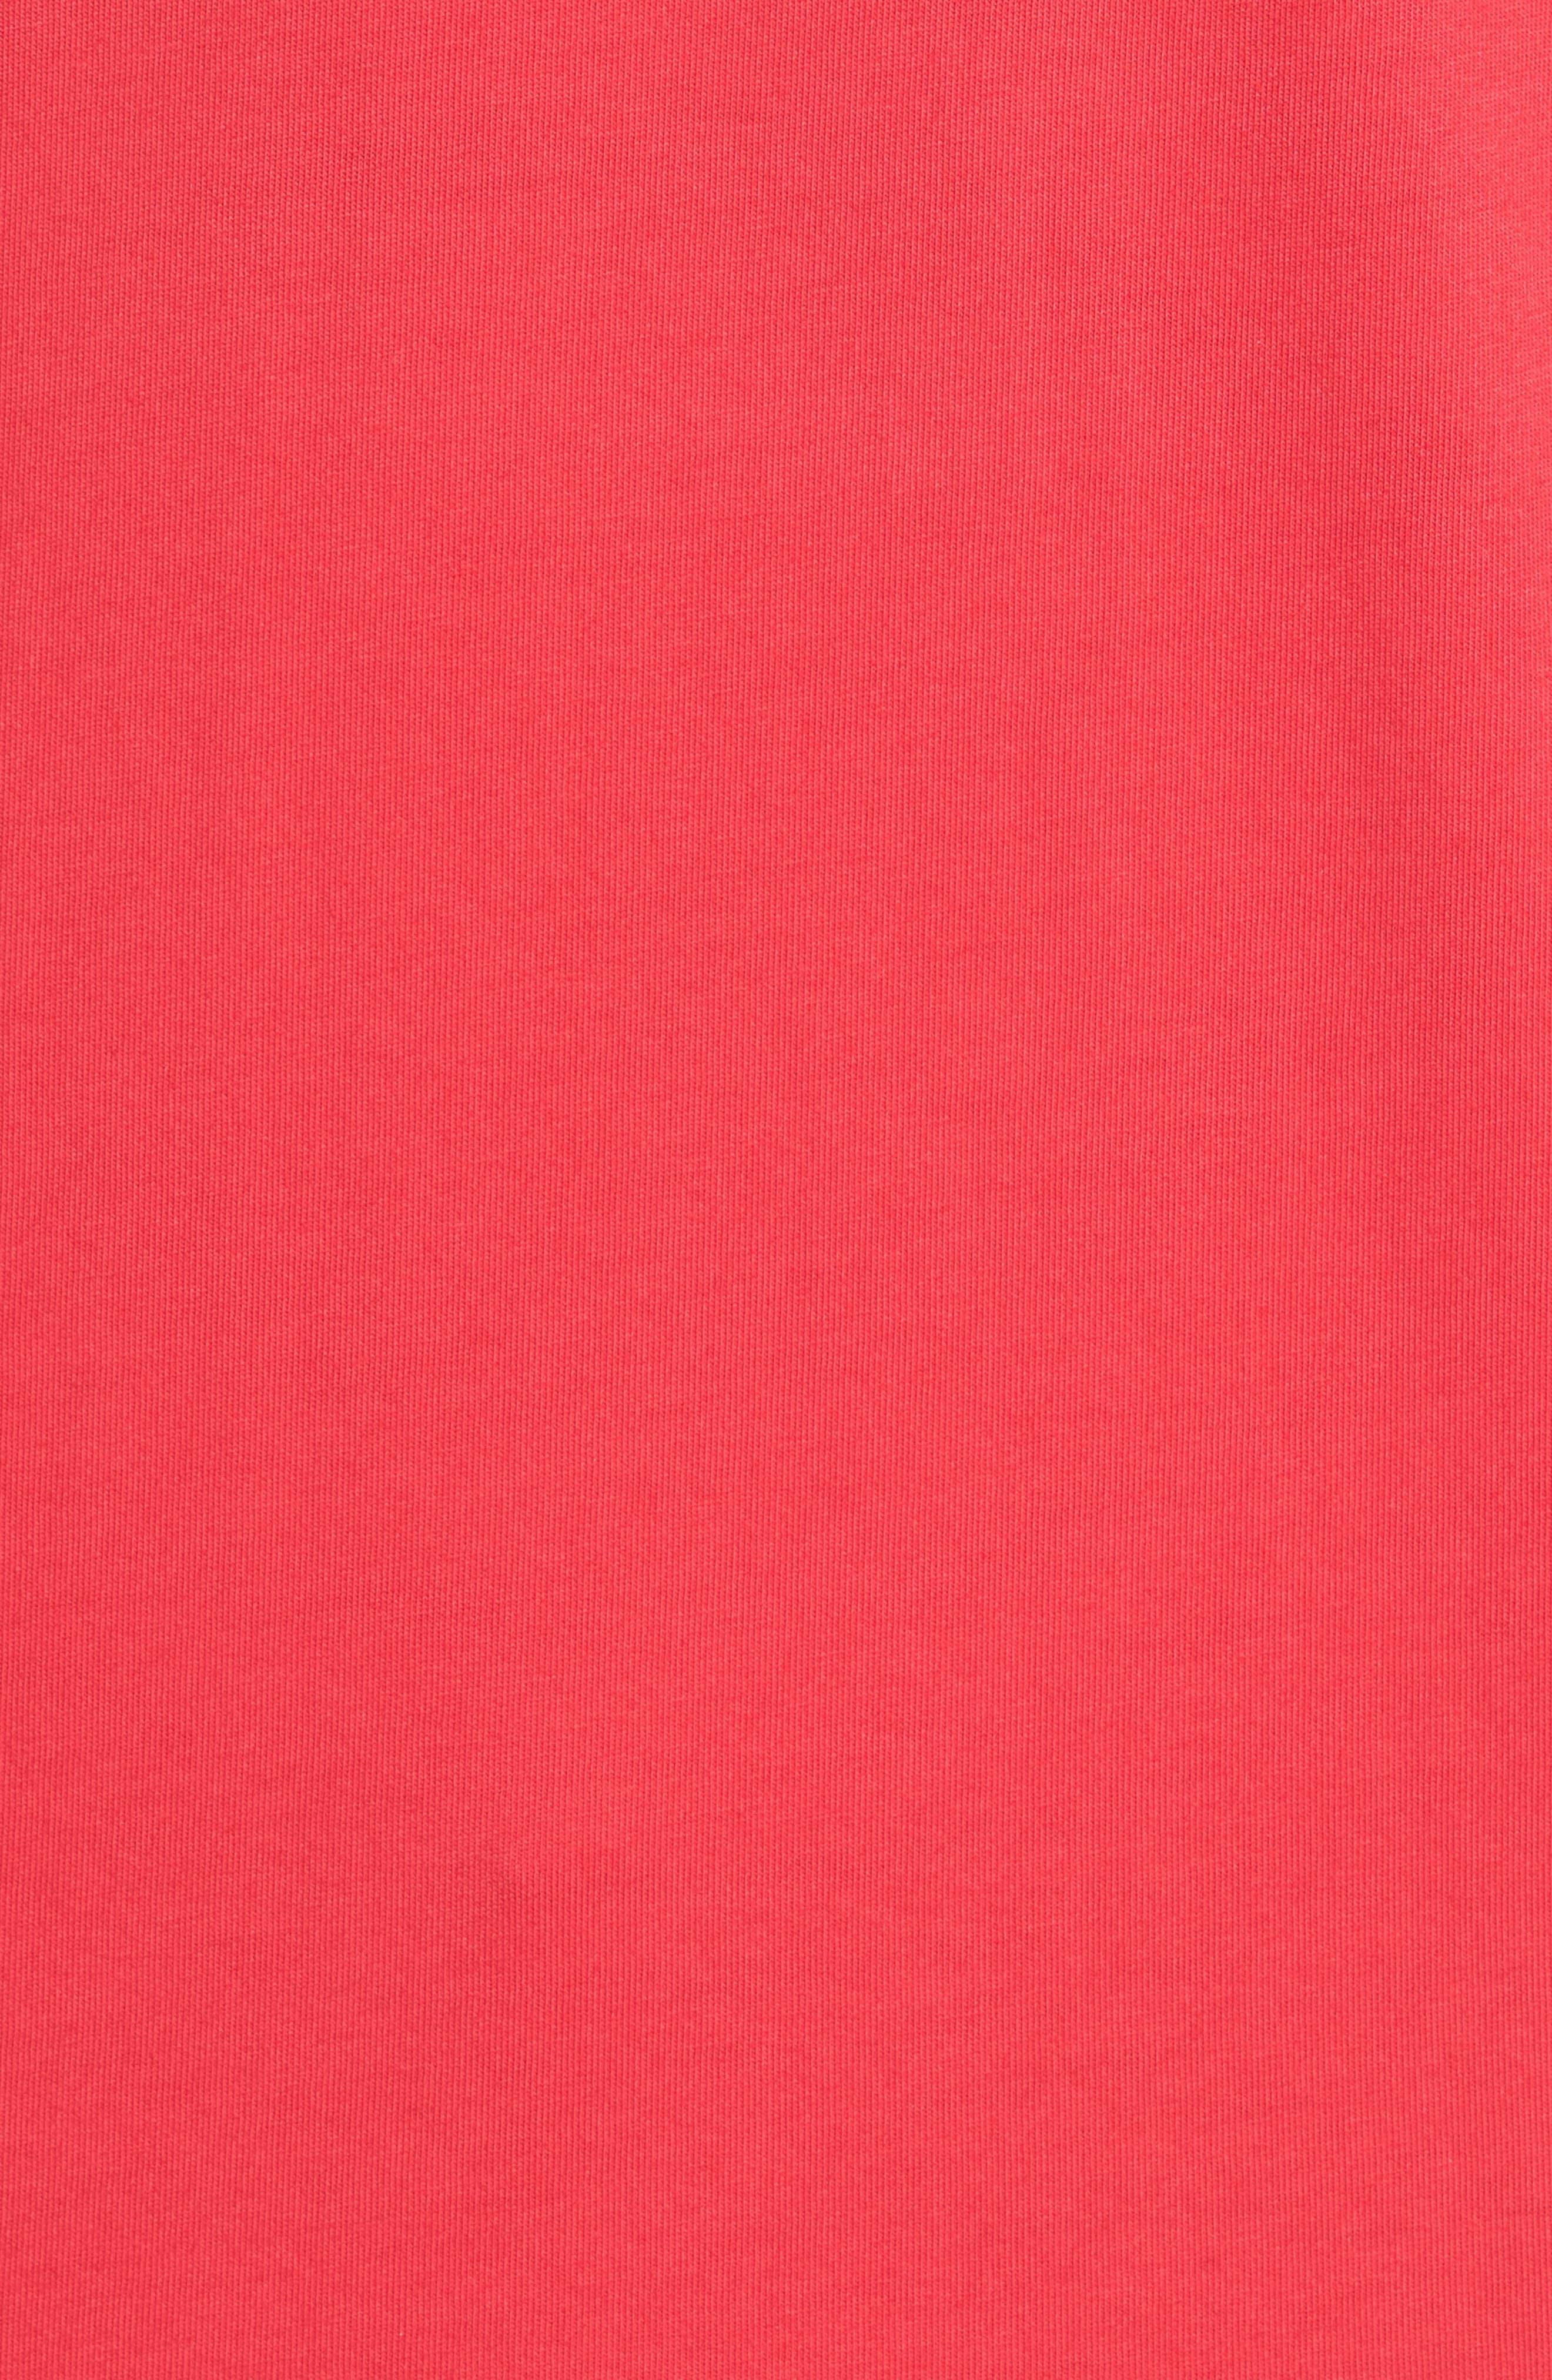 Coastal Burgees Long Sleeve Pocket T-Shirt,                             Alternate thumbnail 5, color,                             639